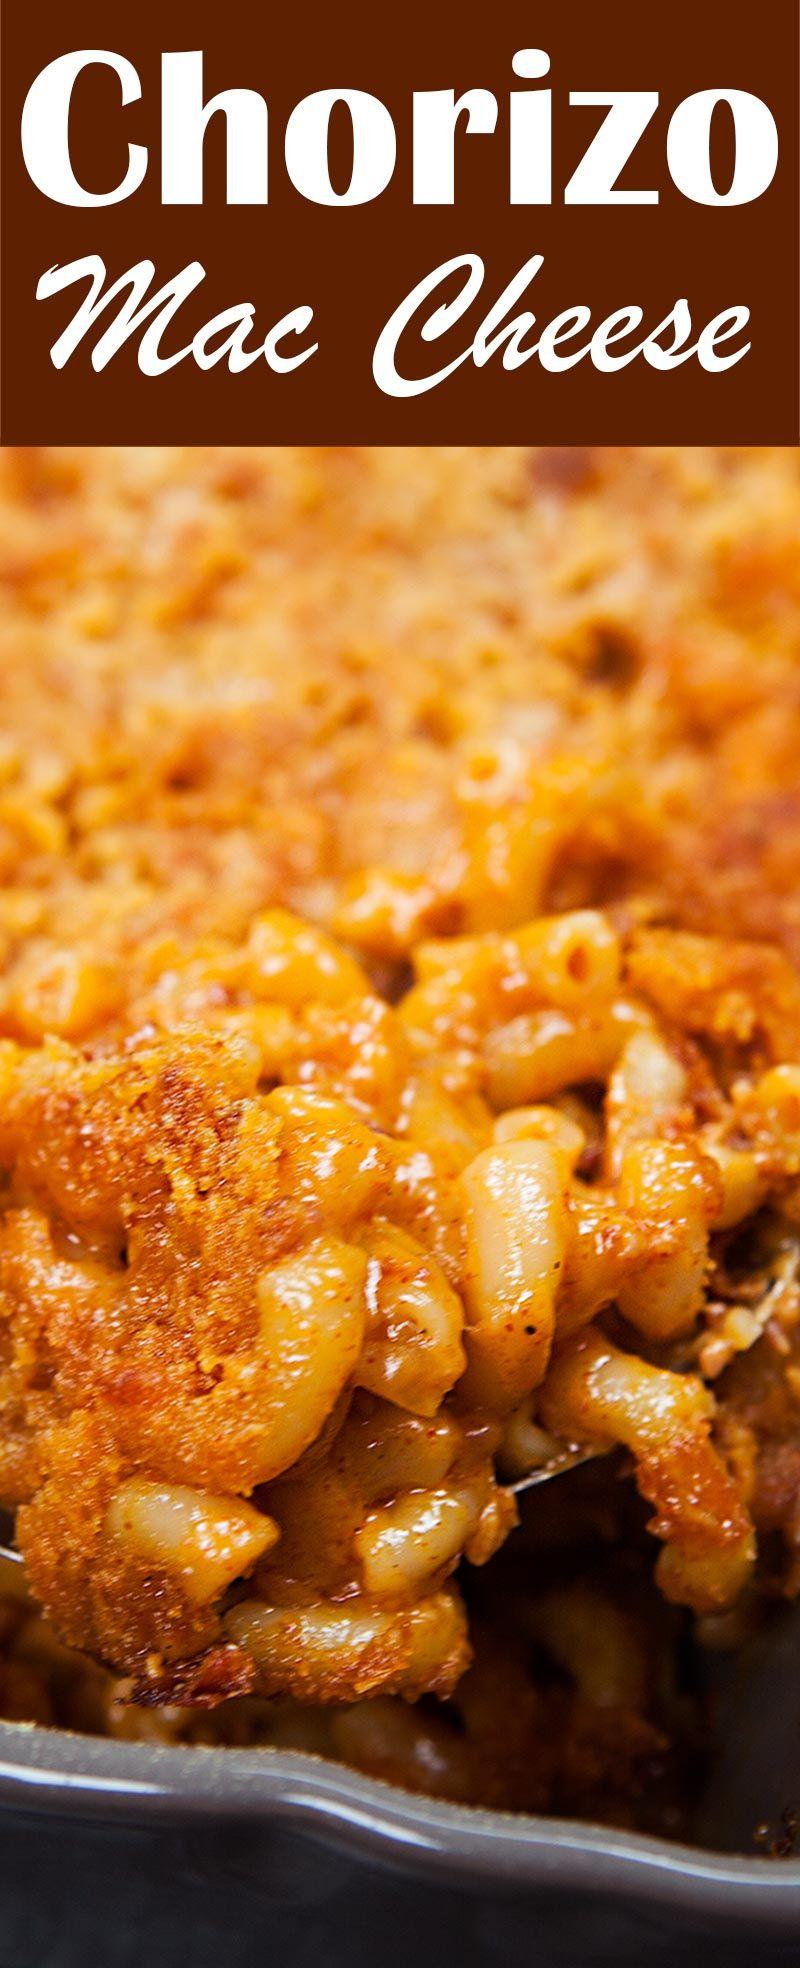 Chorizo Mac & Cheese! Baked mac cheese with cheddar cheese, pepper jack, and Mexican chorizo. Cheesy and spicy! #comfortfood #chorizo #maccheese